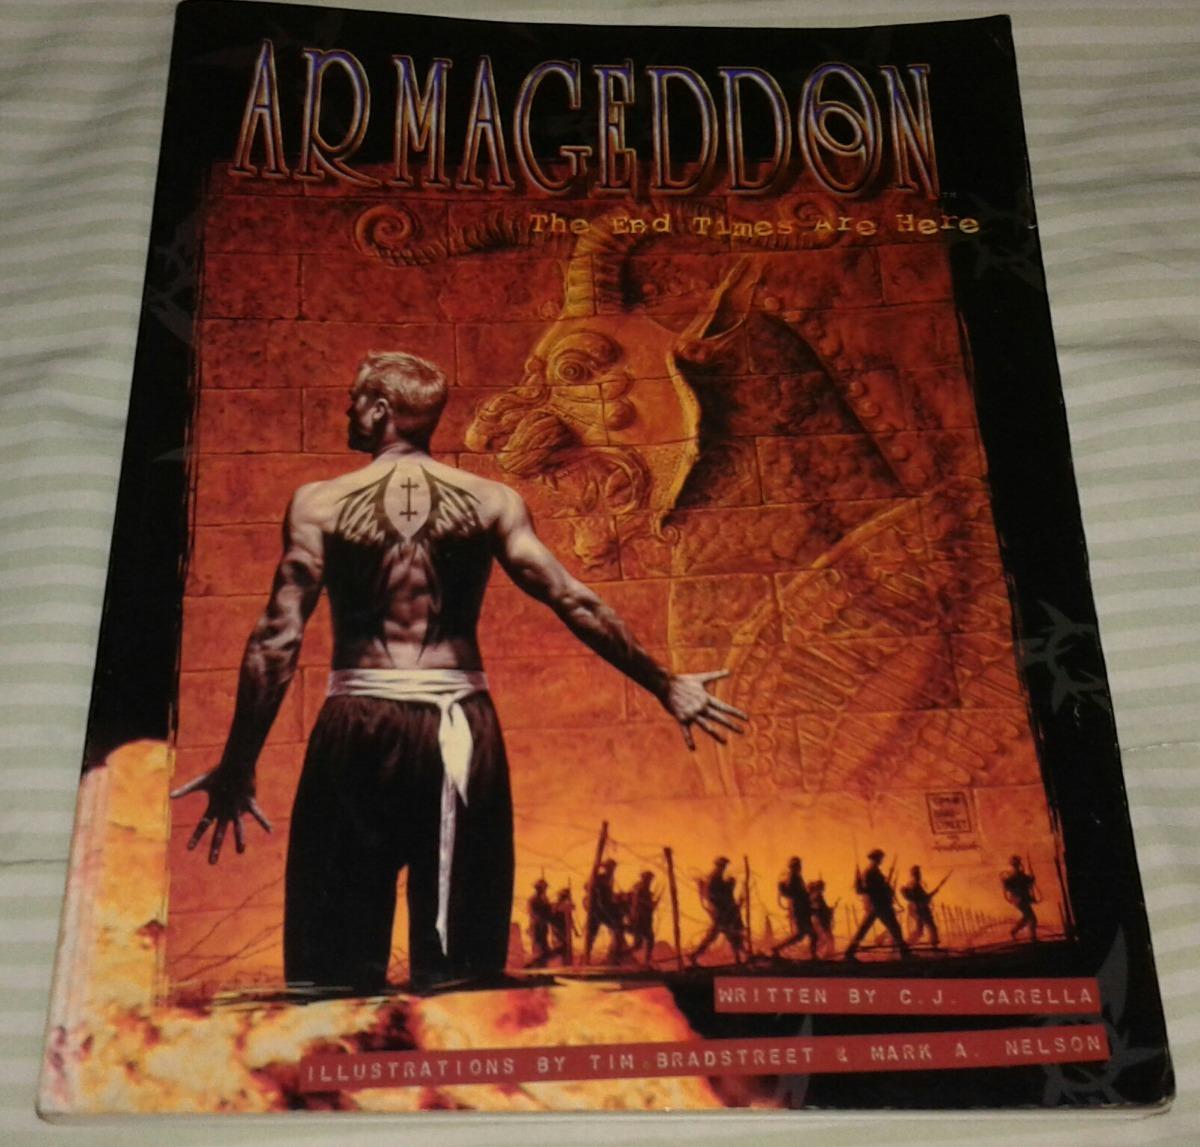 ARMAGEDDON THE END TIMES RPG EBOOK DOWNLOAD